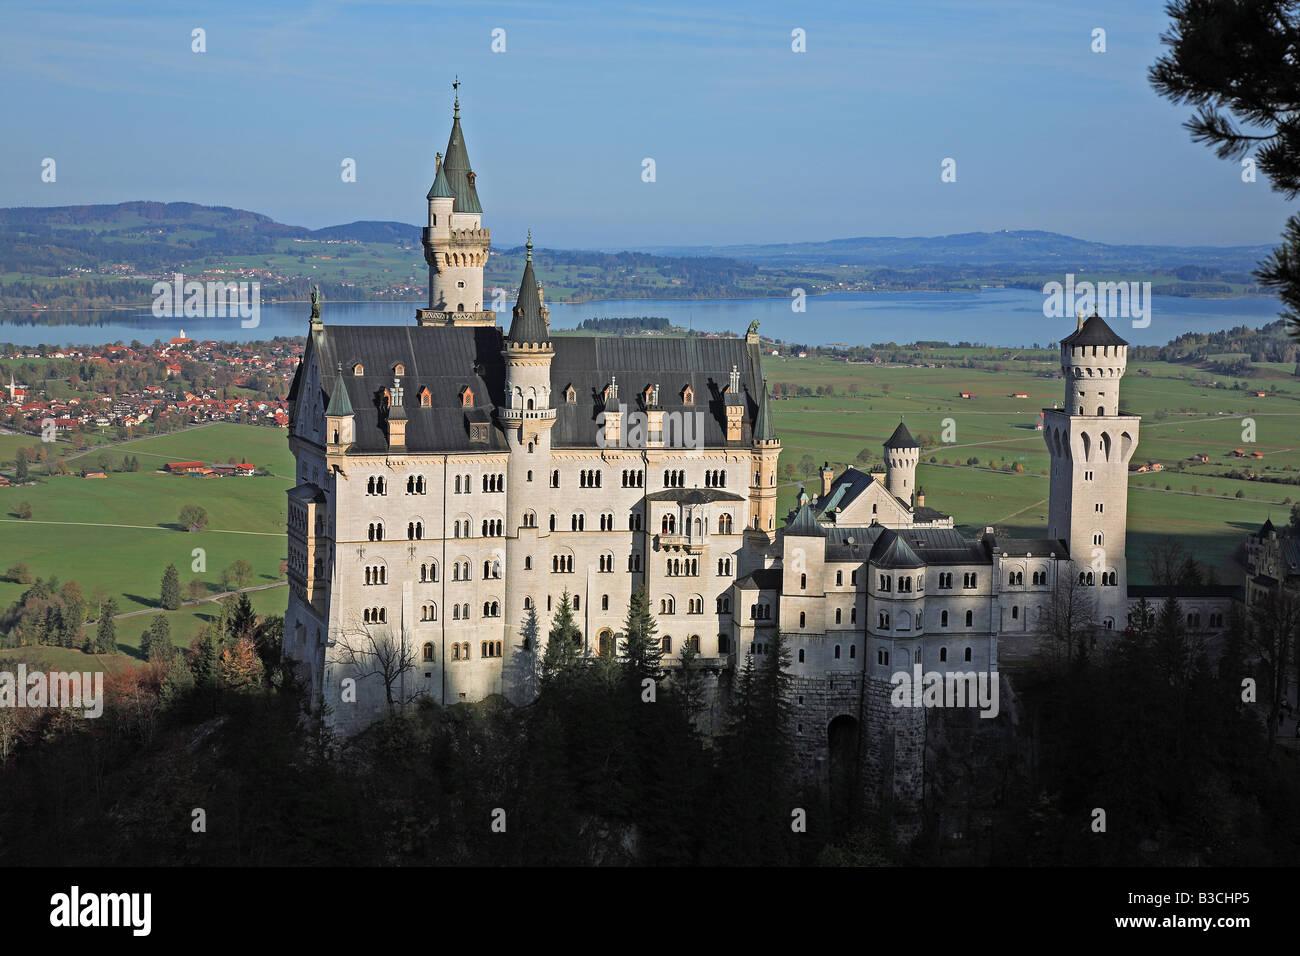 Neuschwanstein Castle Schloss Neuschwanstein lit New Swan Stone palace is a 19th century Bavarian palace Located - Stock Image